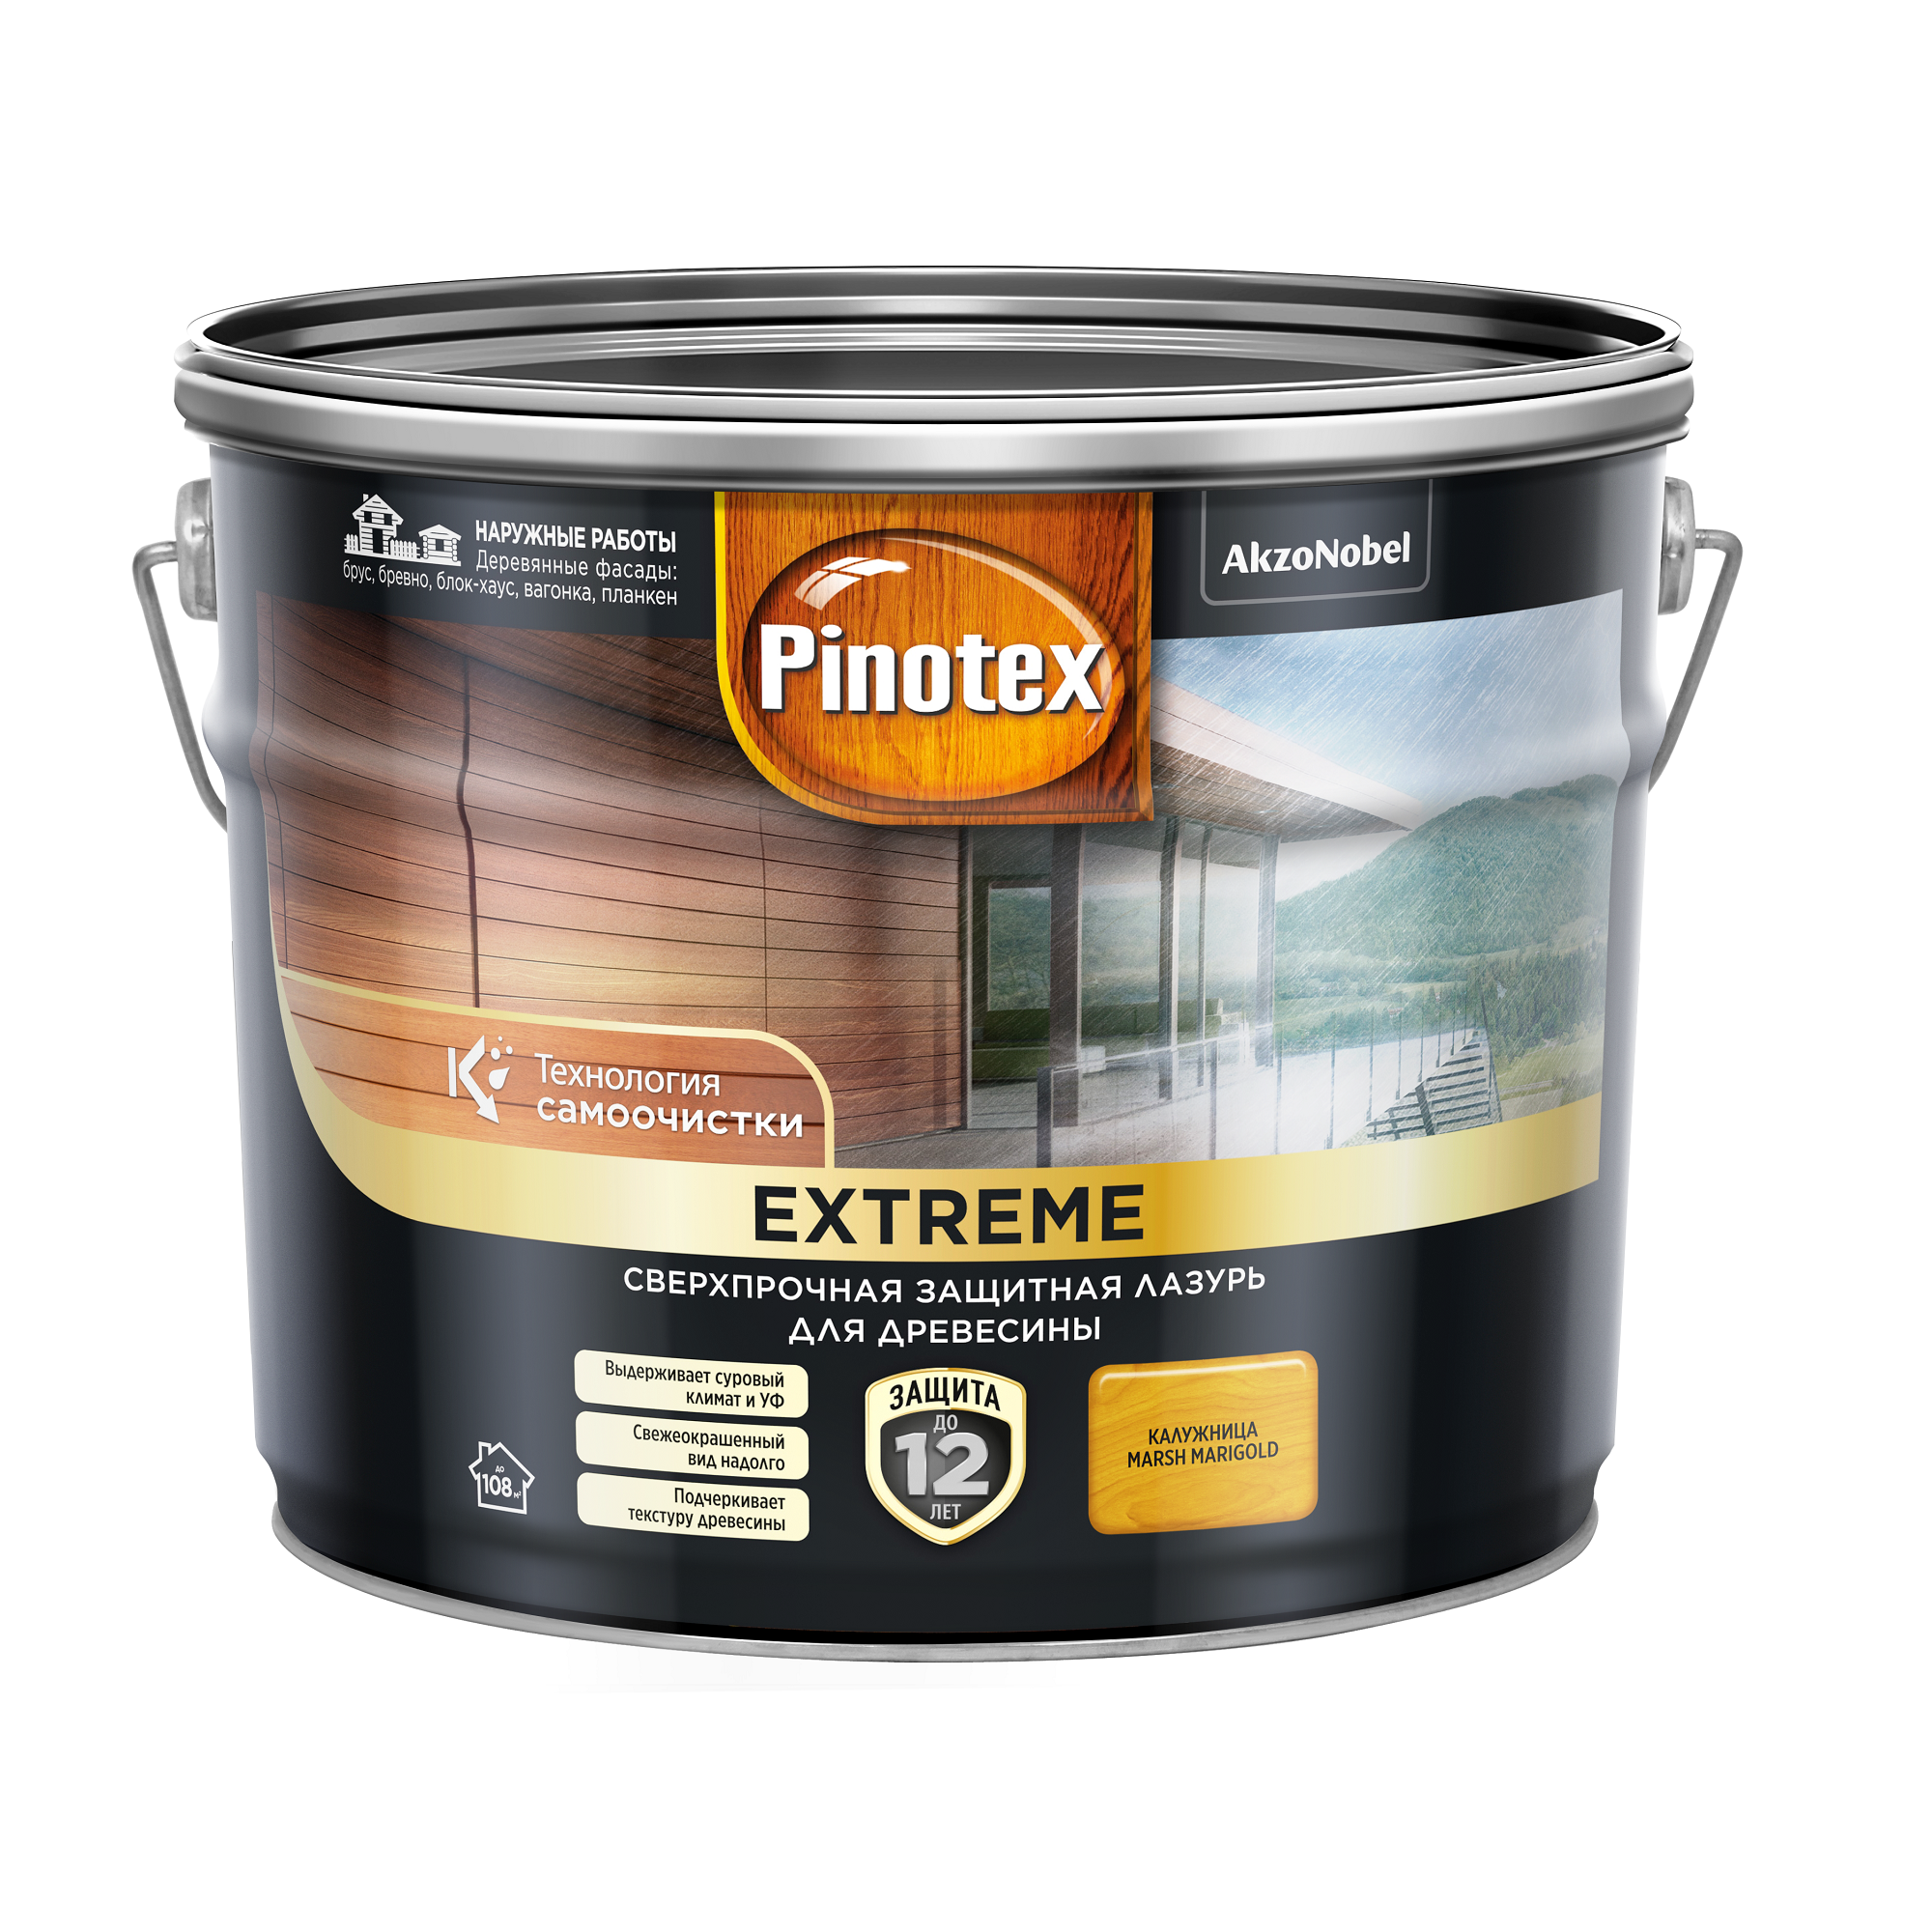 Лазурь для дерева Pinotex extreme калужница 9л